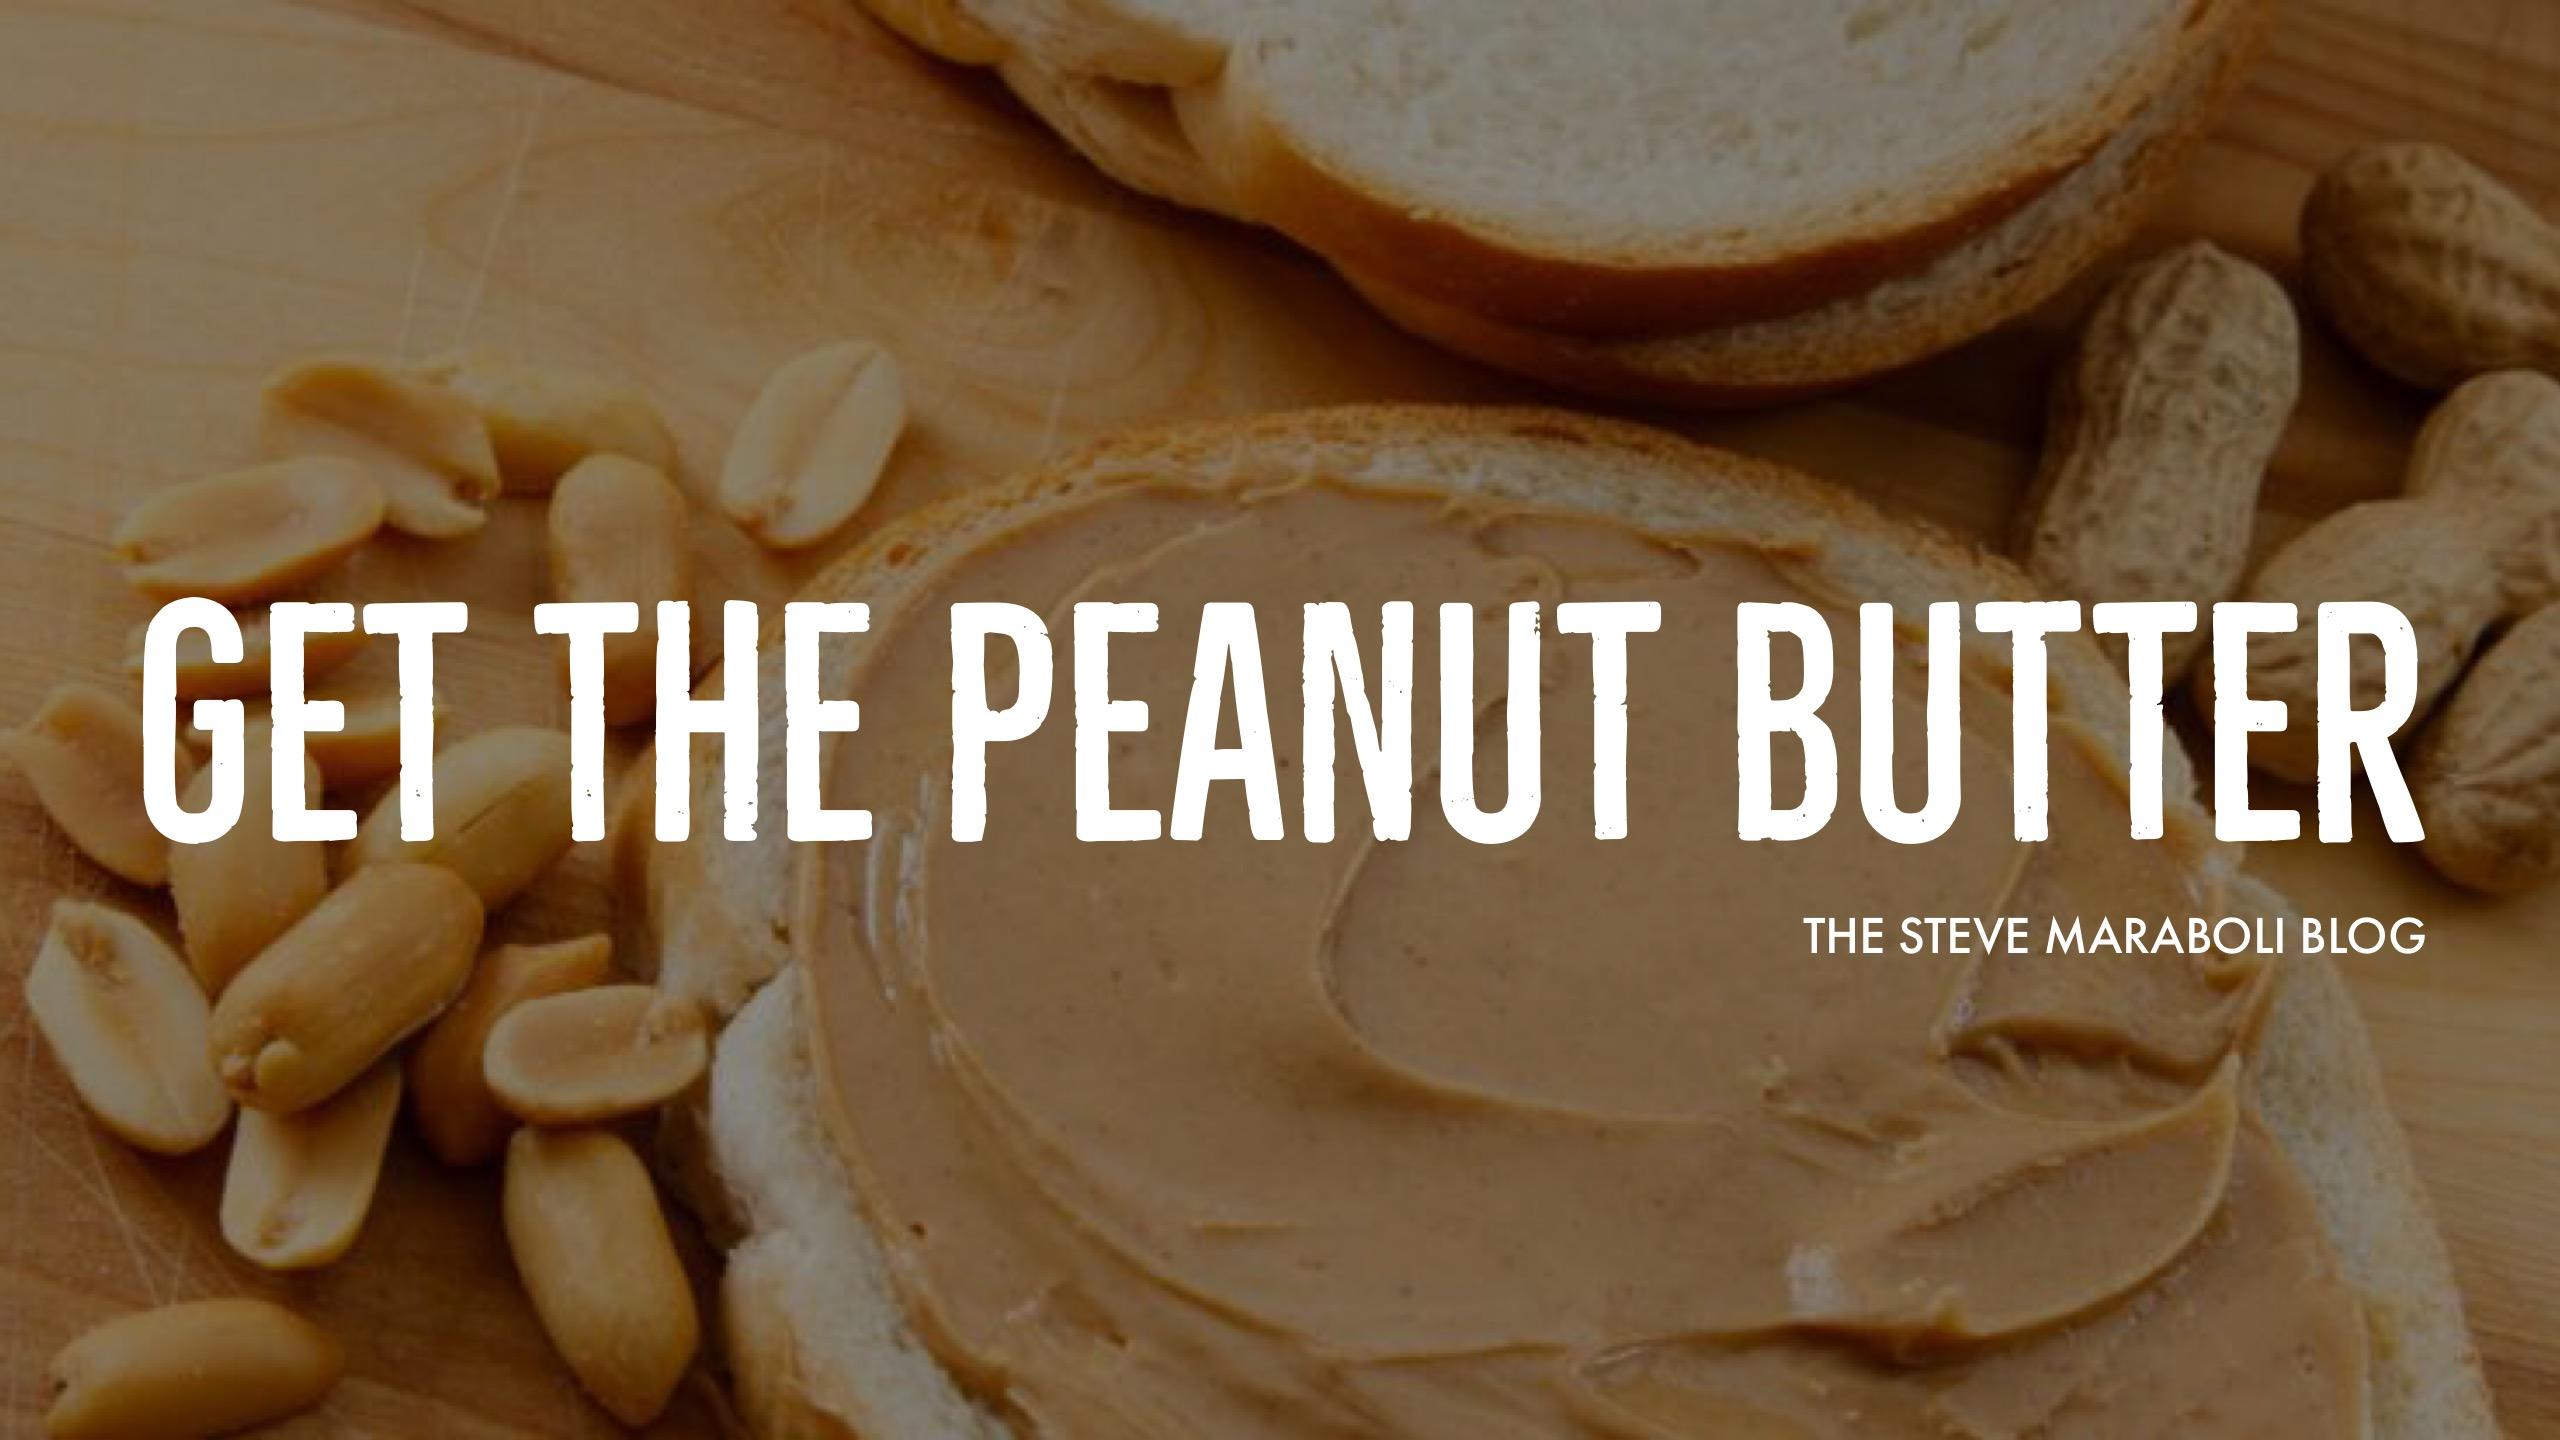 Get the Peanut Butter